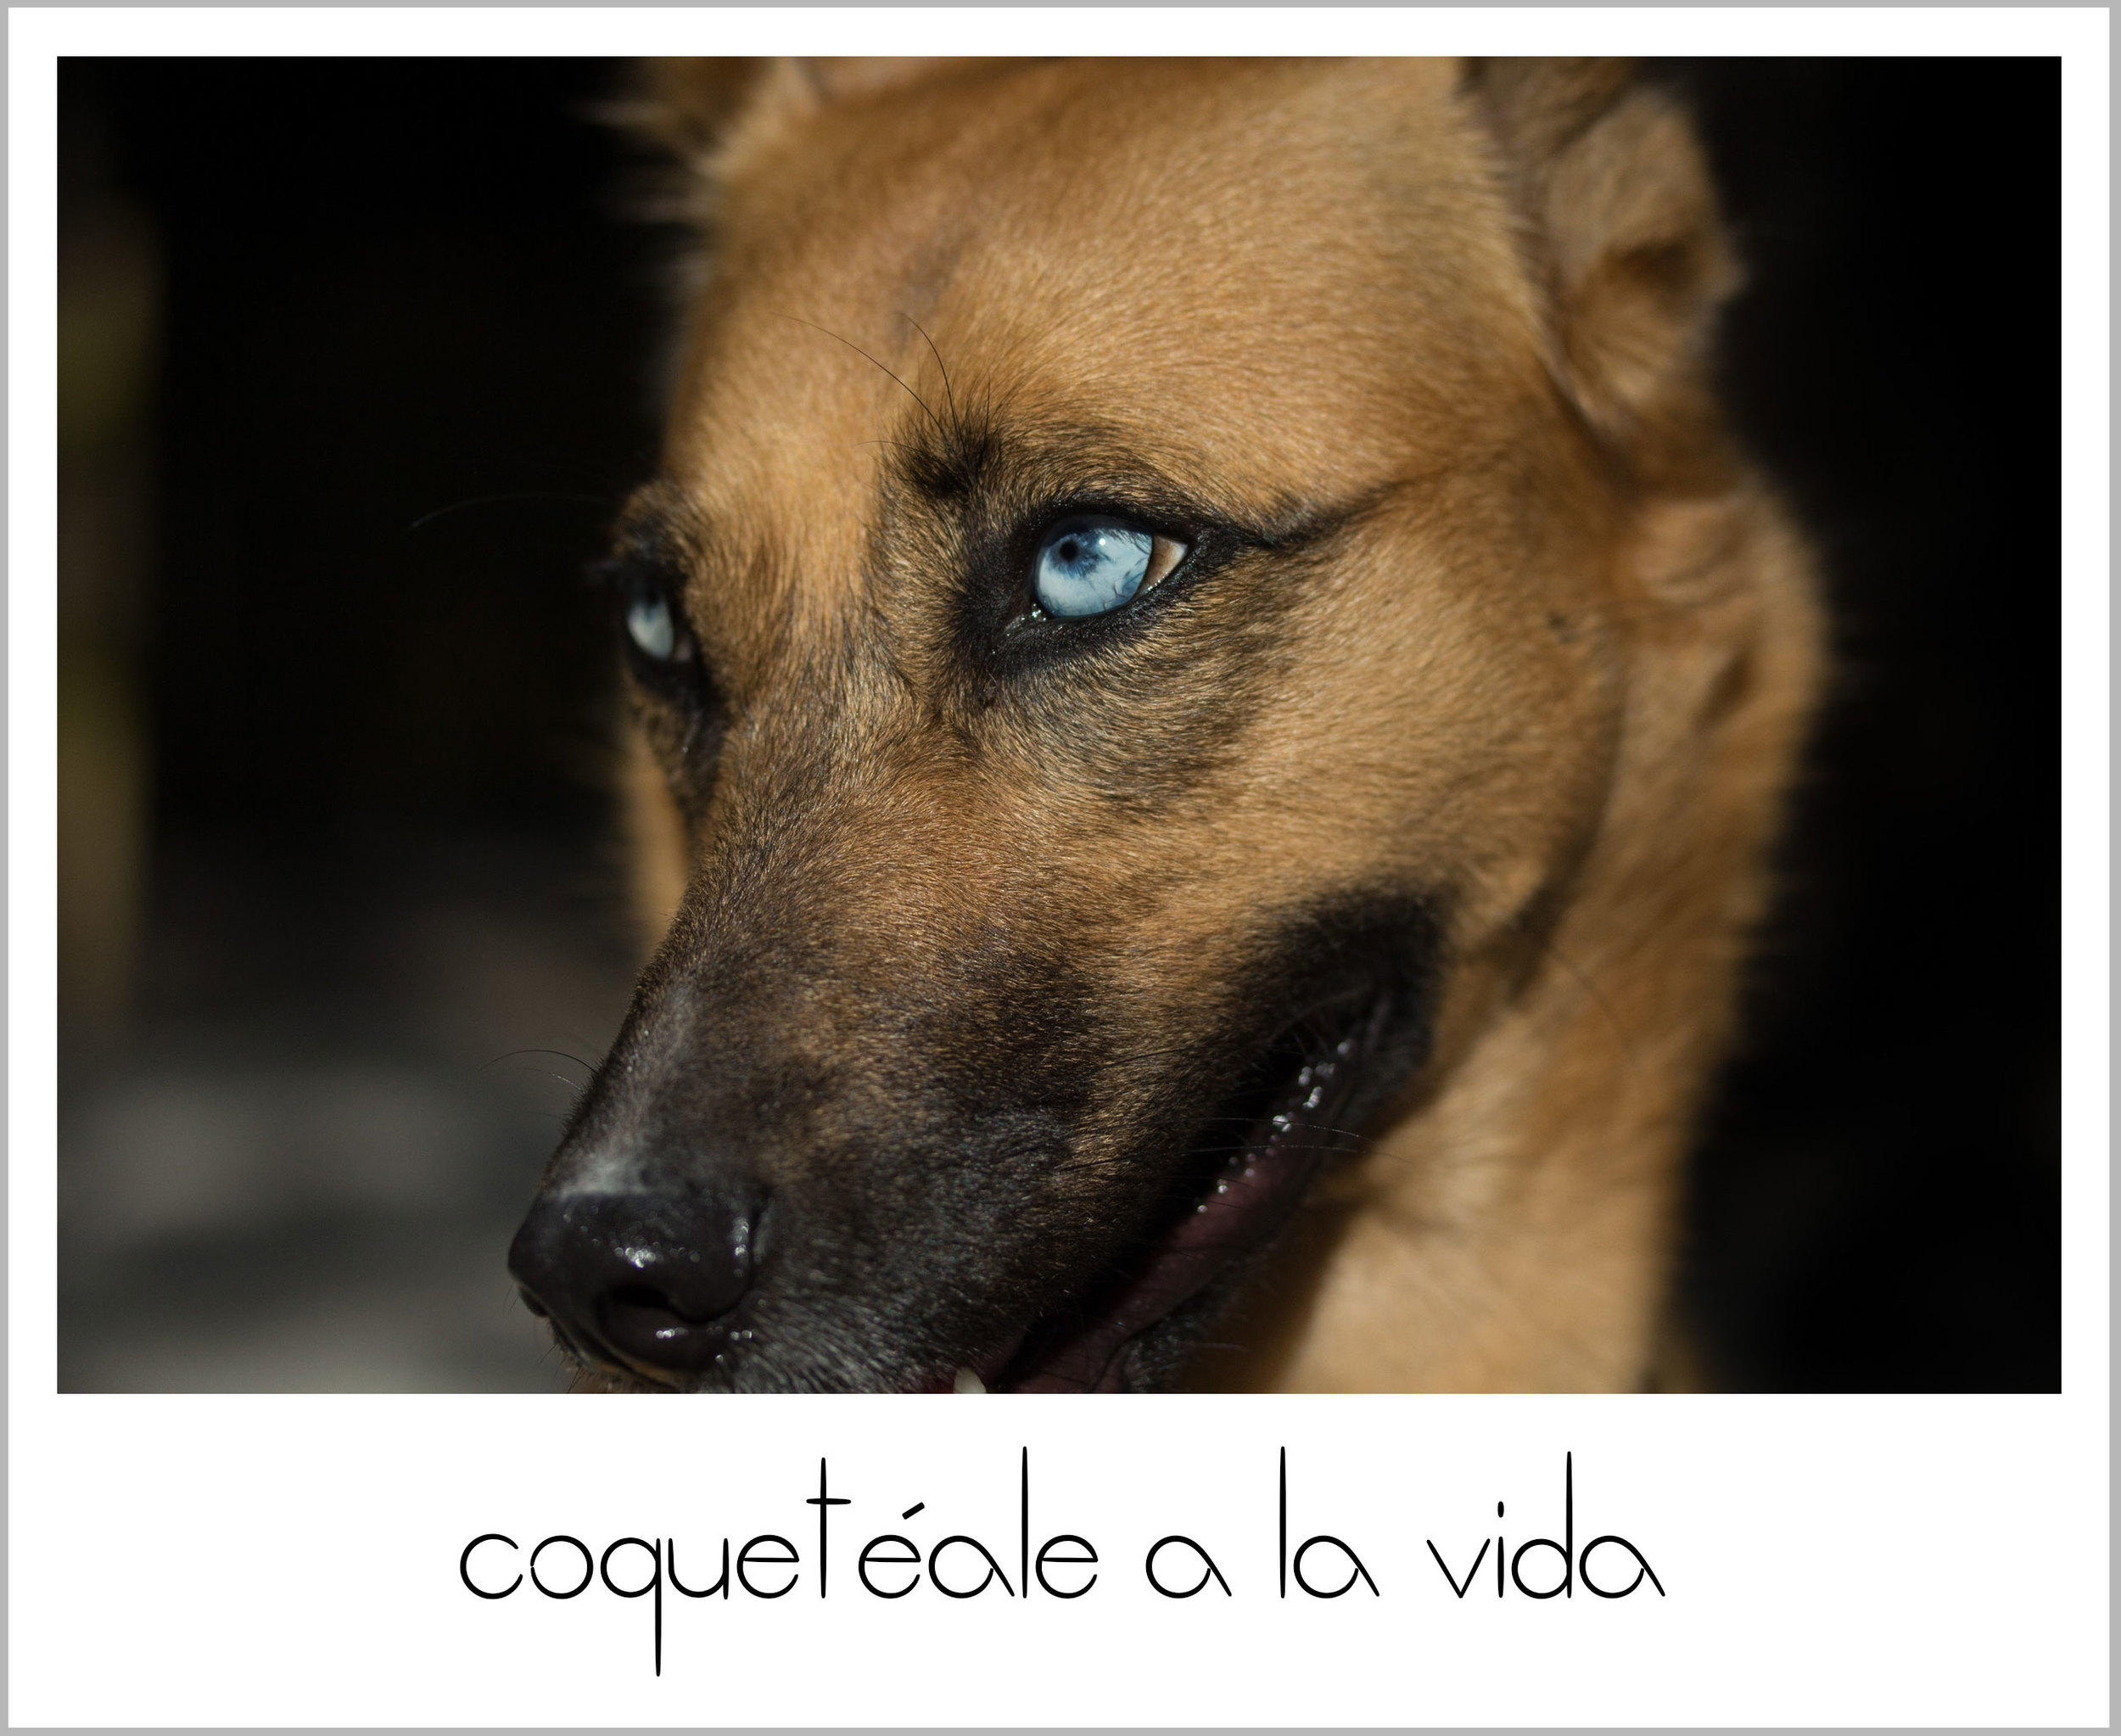 CoquetealeAlaVida